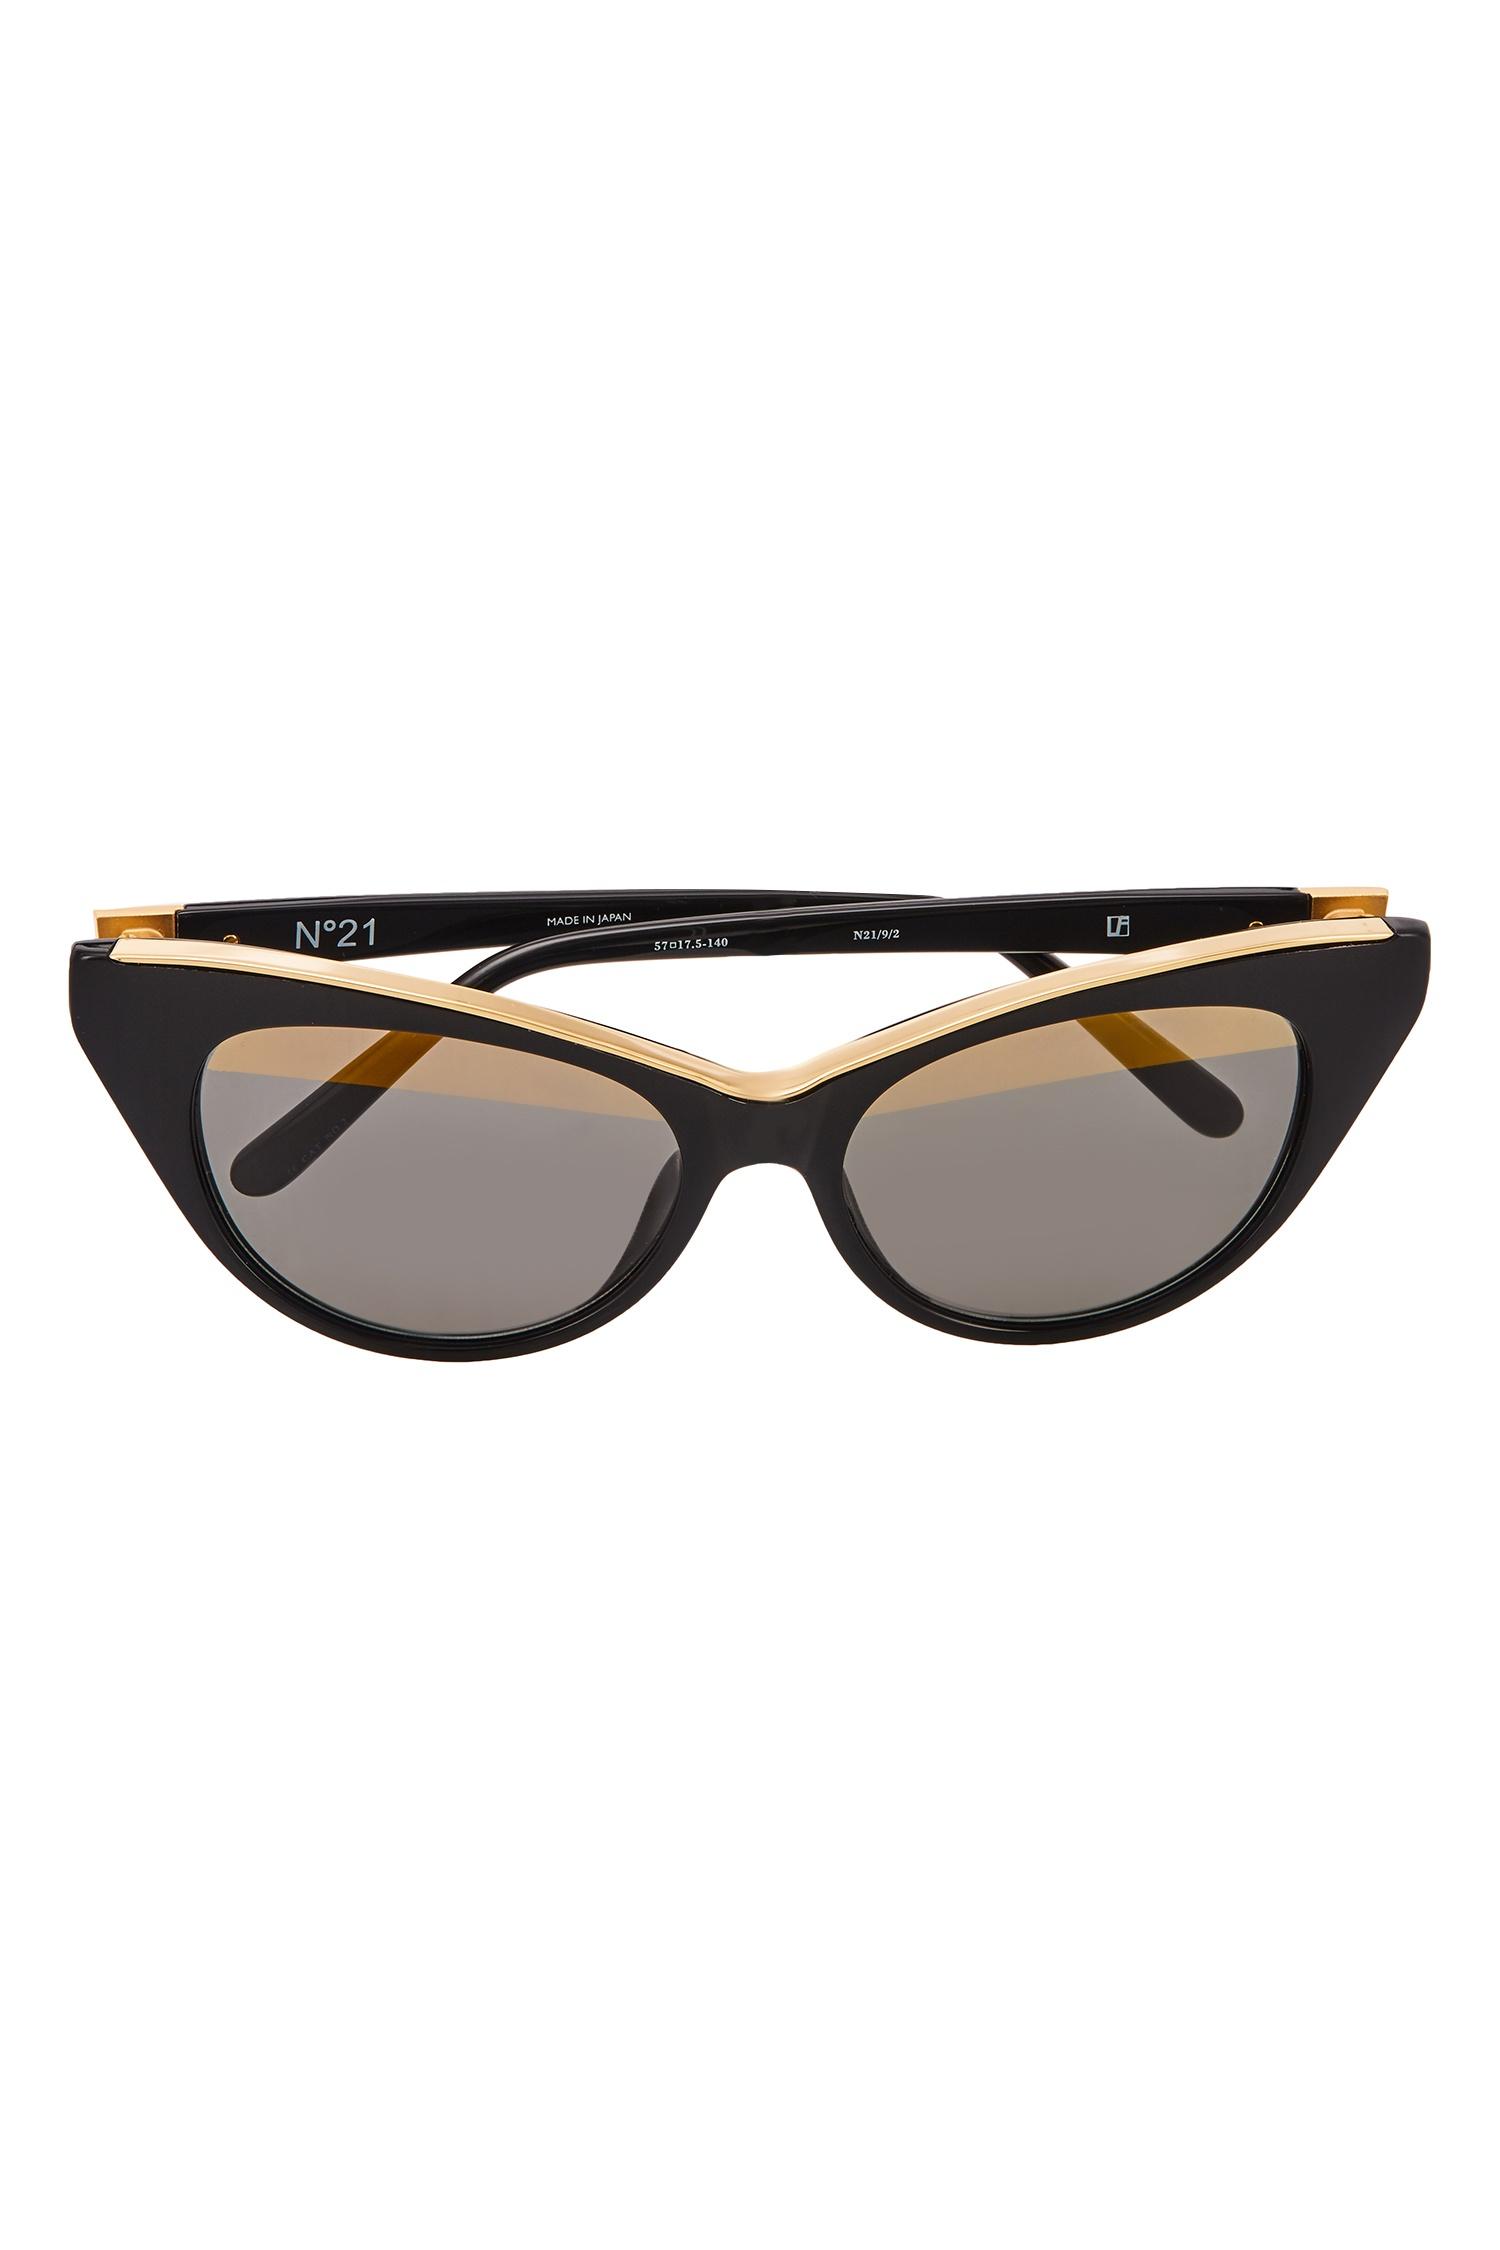 1b442fd44fa Солнцезащитные очки cat eye Linda Farrow x No.21 Linda Farrow (фото)